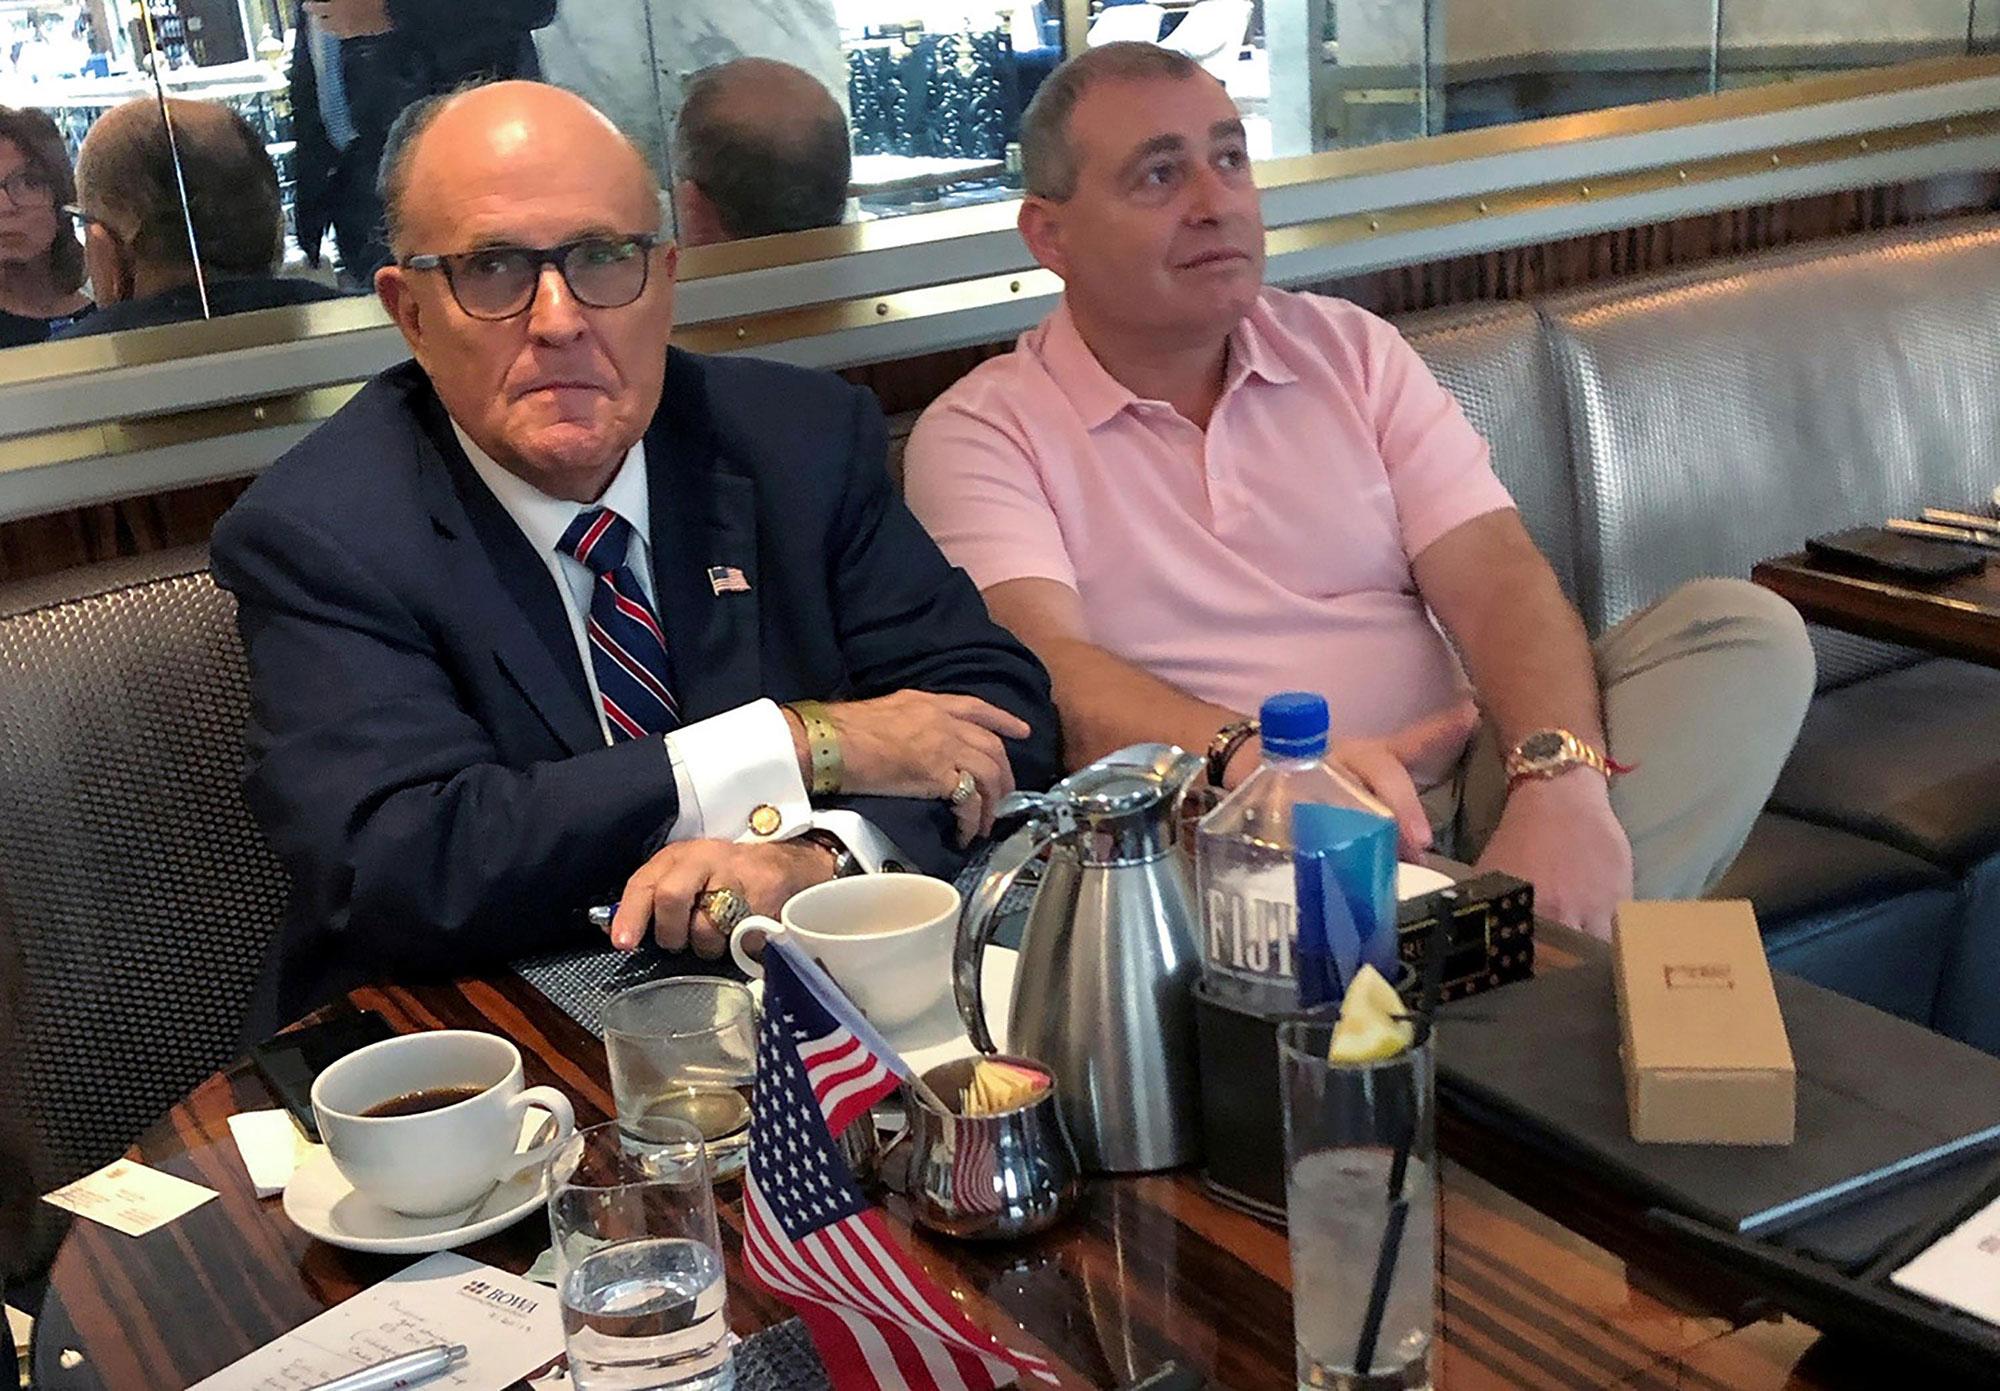 President Trump's personal lawyer Rudy Giuliani has coffee with Ukrainian-American businessman Lev Parnas at the Trump International Hotel in Washington, Sept. 20.